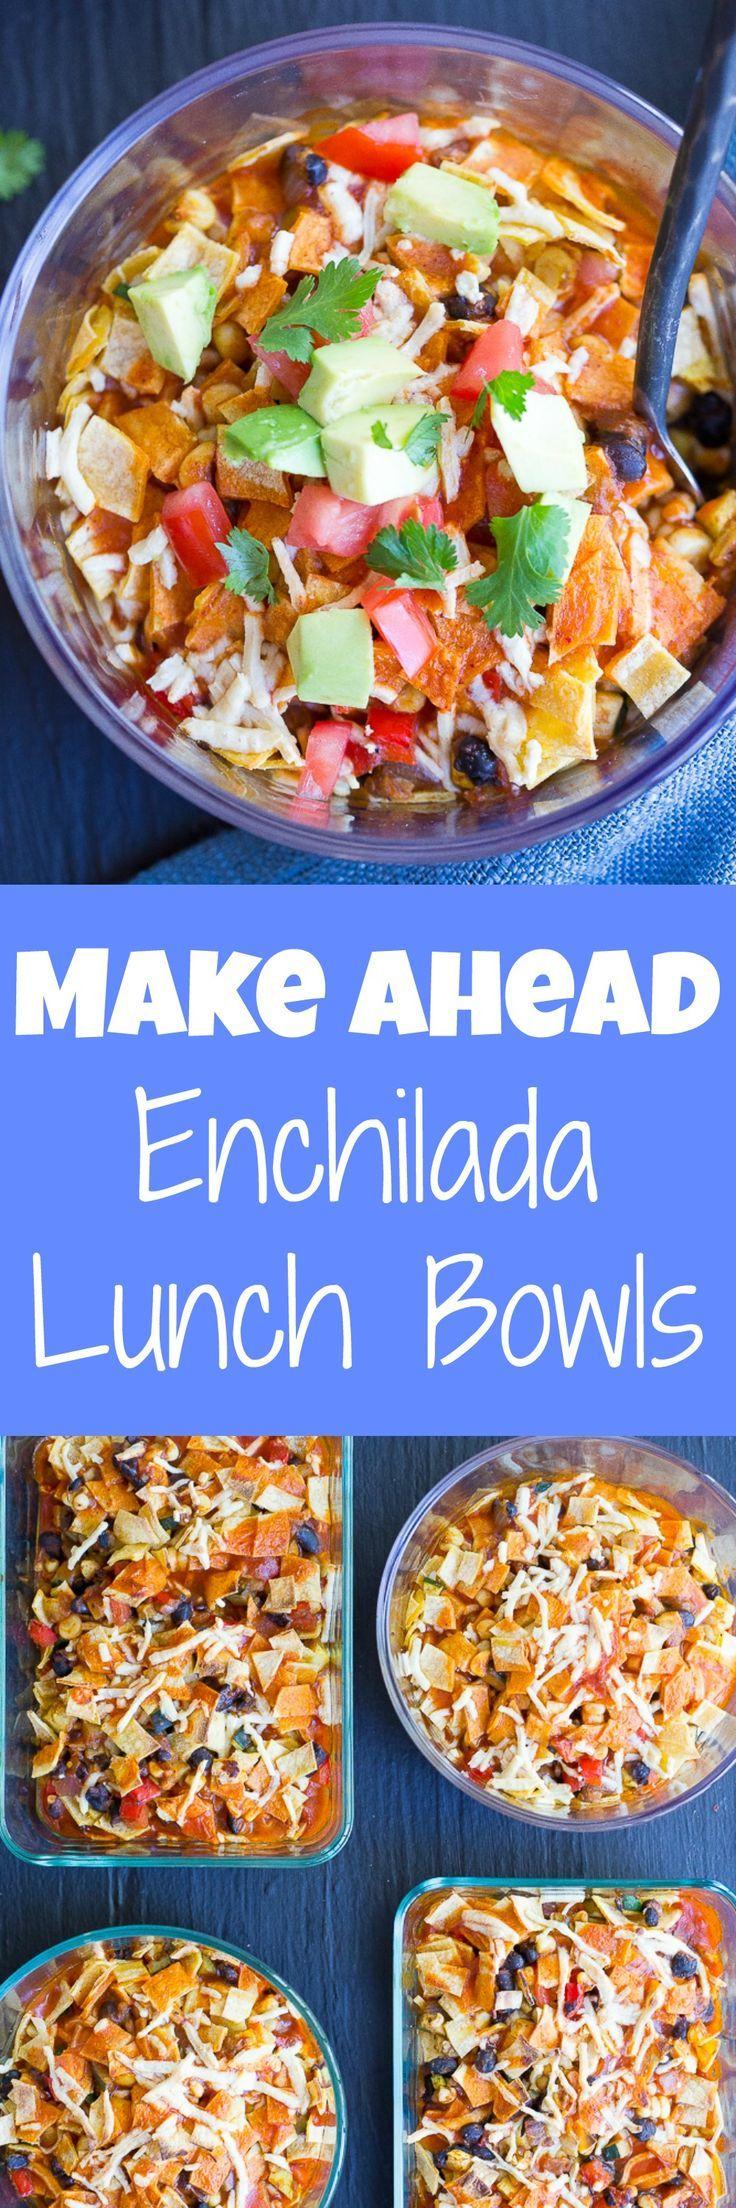 The 25 best sunday lunch ideas ideas on pinterest cheap for Sunday lunch ideas